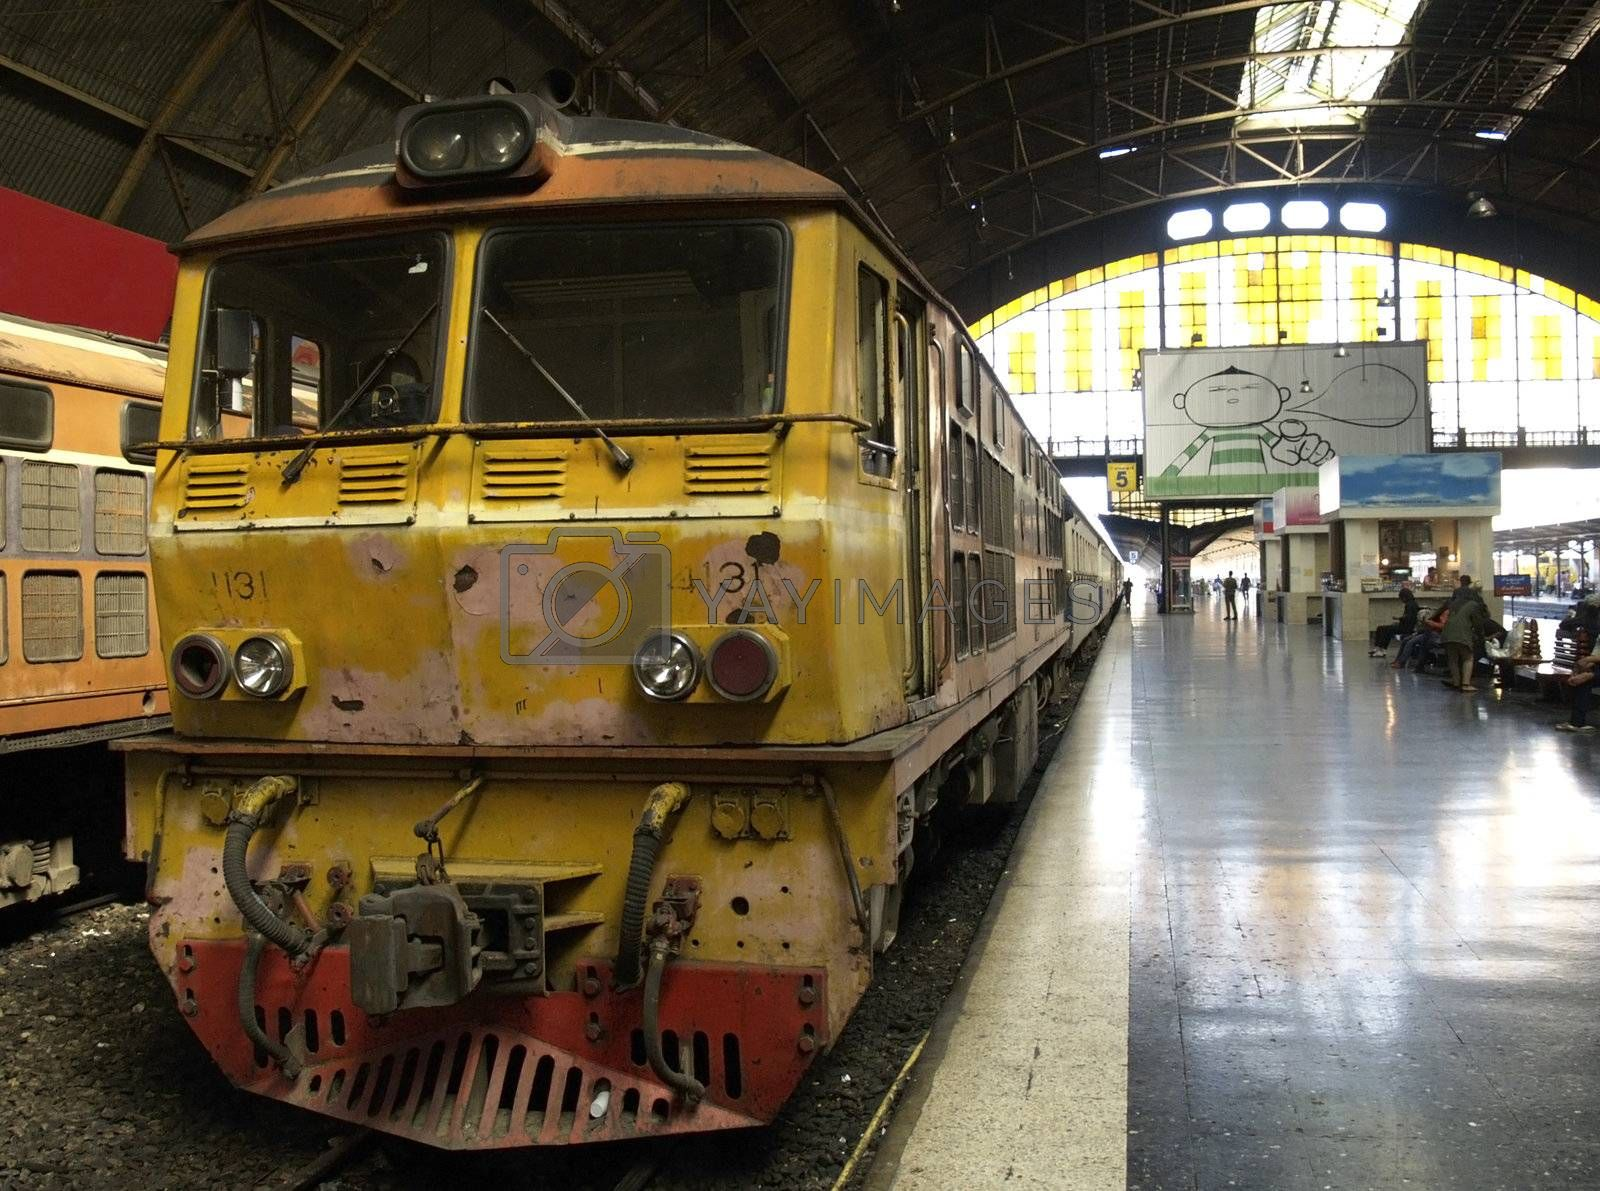 Railway train at station in Bangkok by epixx